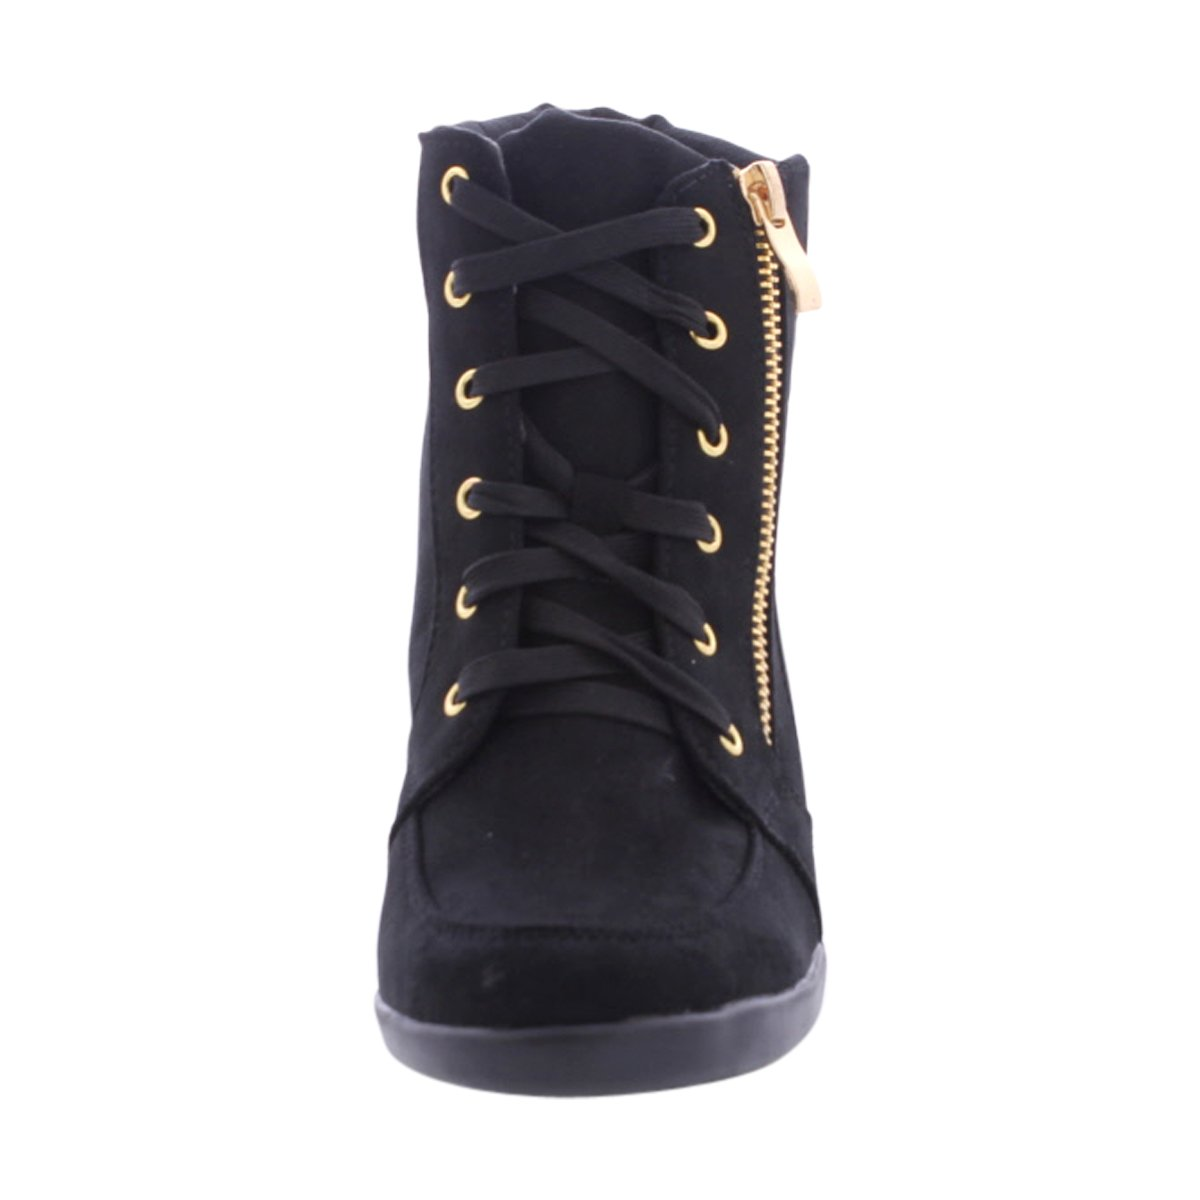 Forever - Women's Gold Side Black Zipper Wedge Sneakers - Black Side B01M23UNSV 10 B(M) US Black 3cfa5a